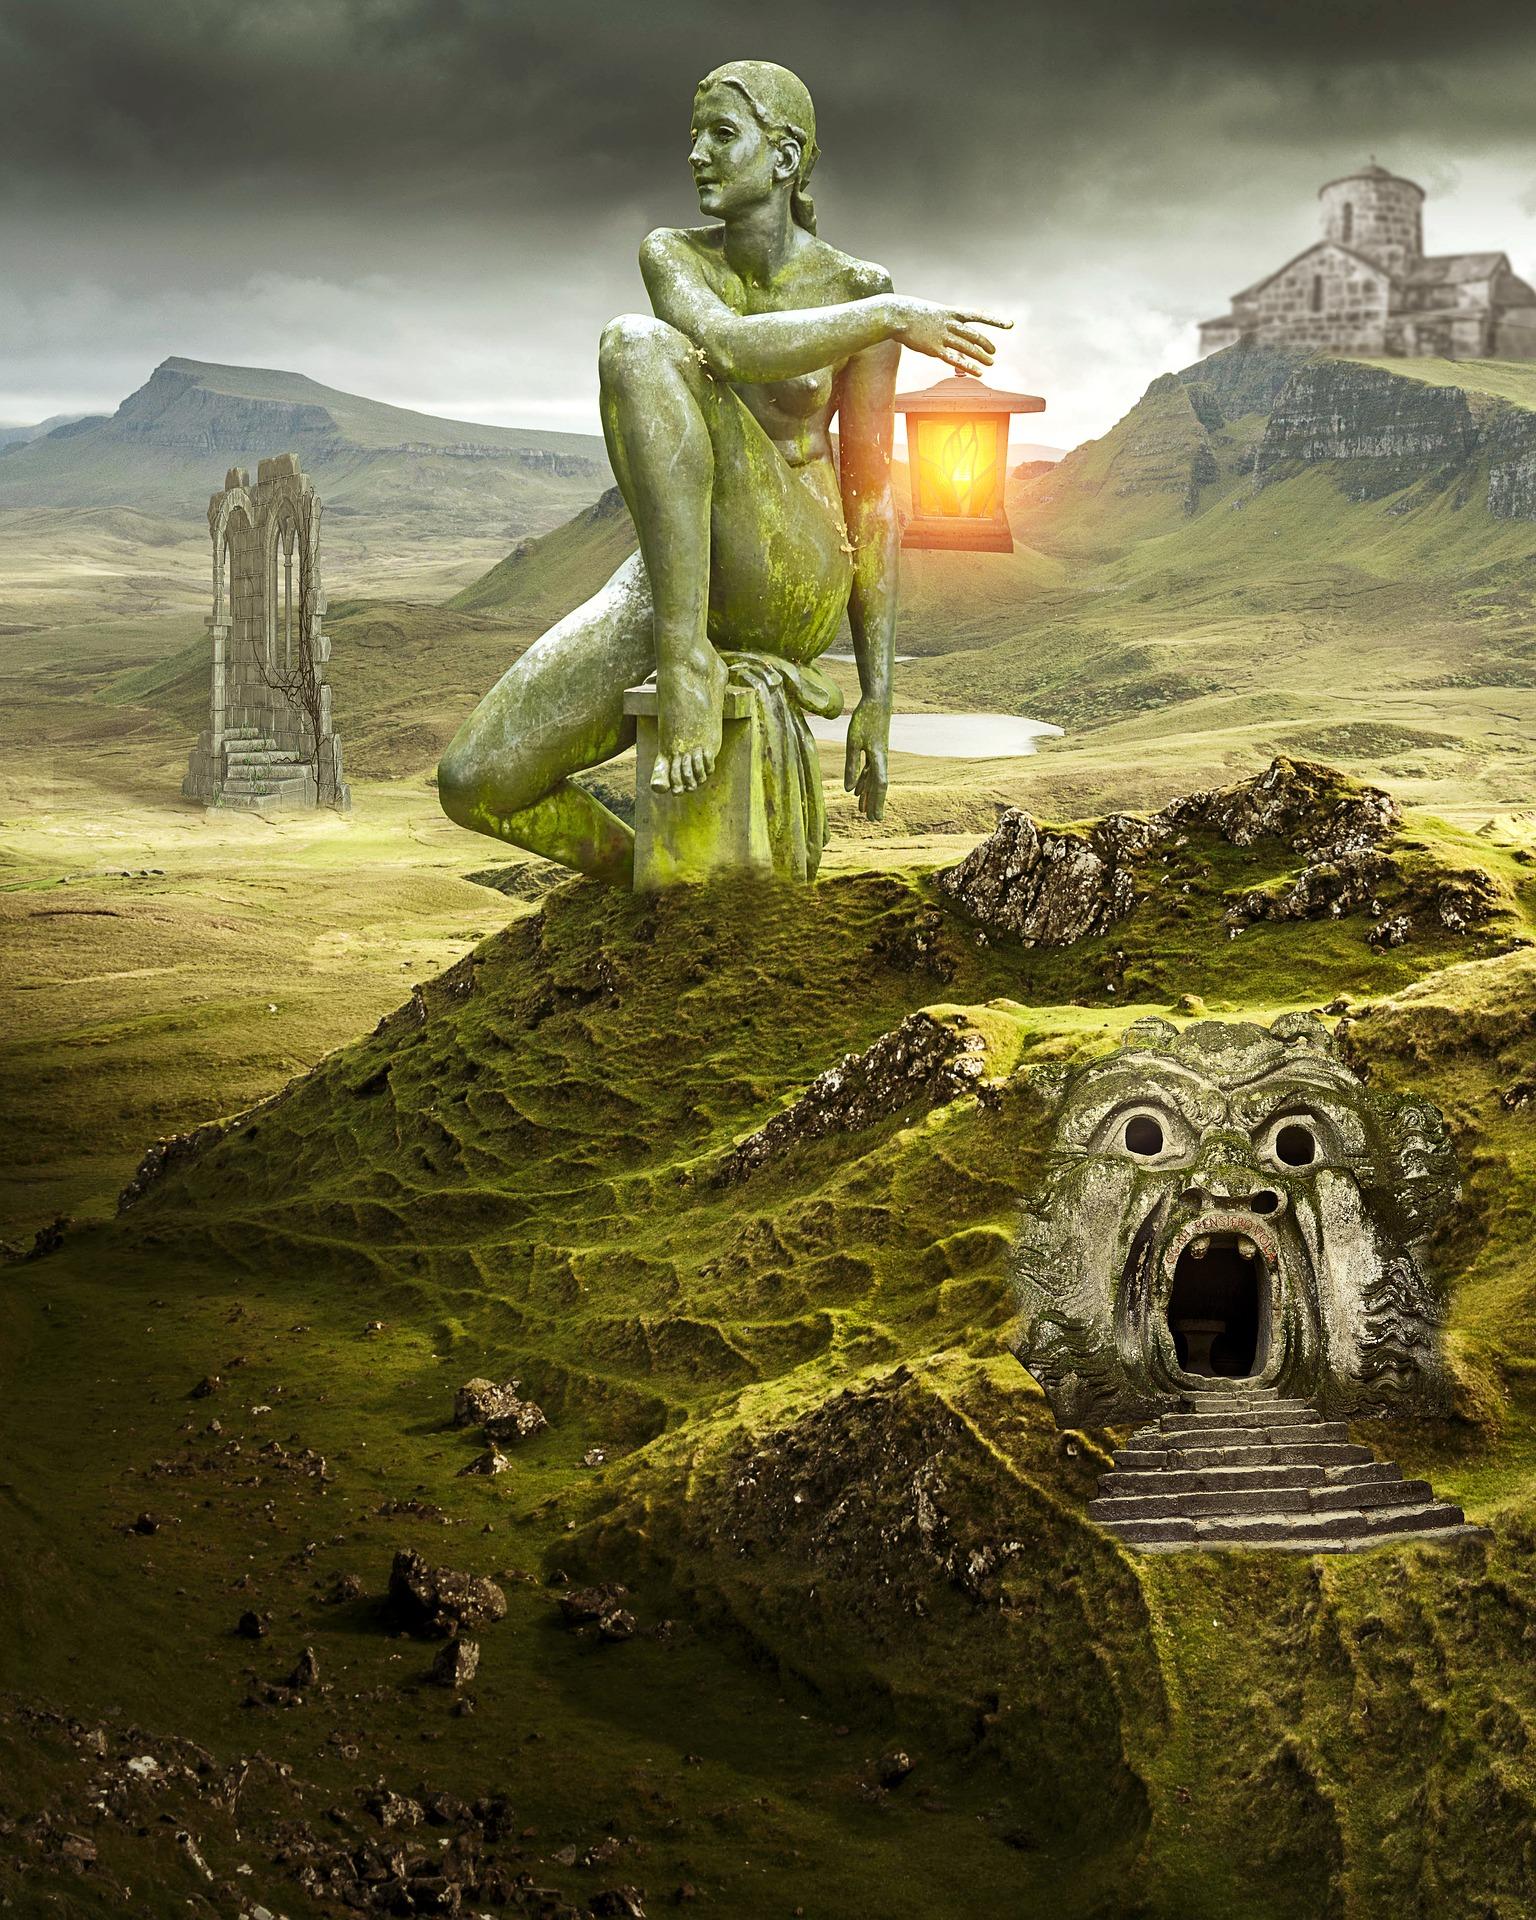 Symbolic rendition of entrance to underworld. (Image via maxpixel / CC0 1.0)